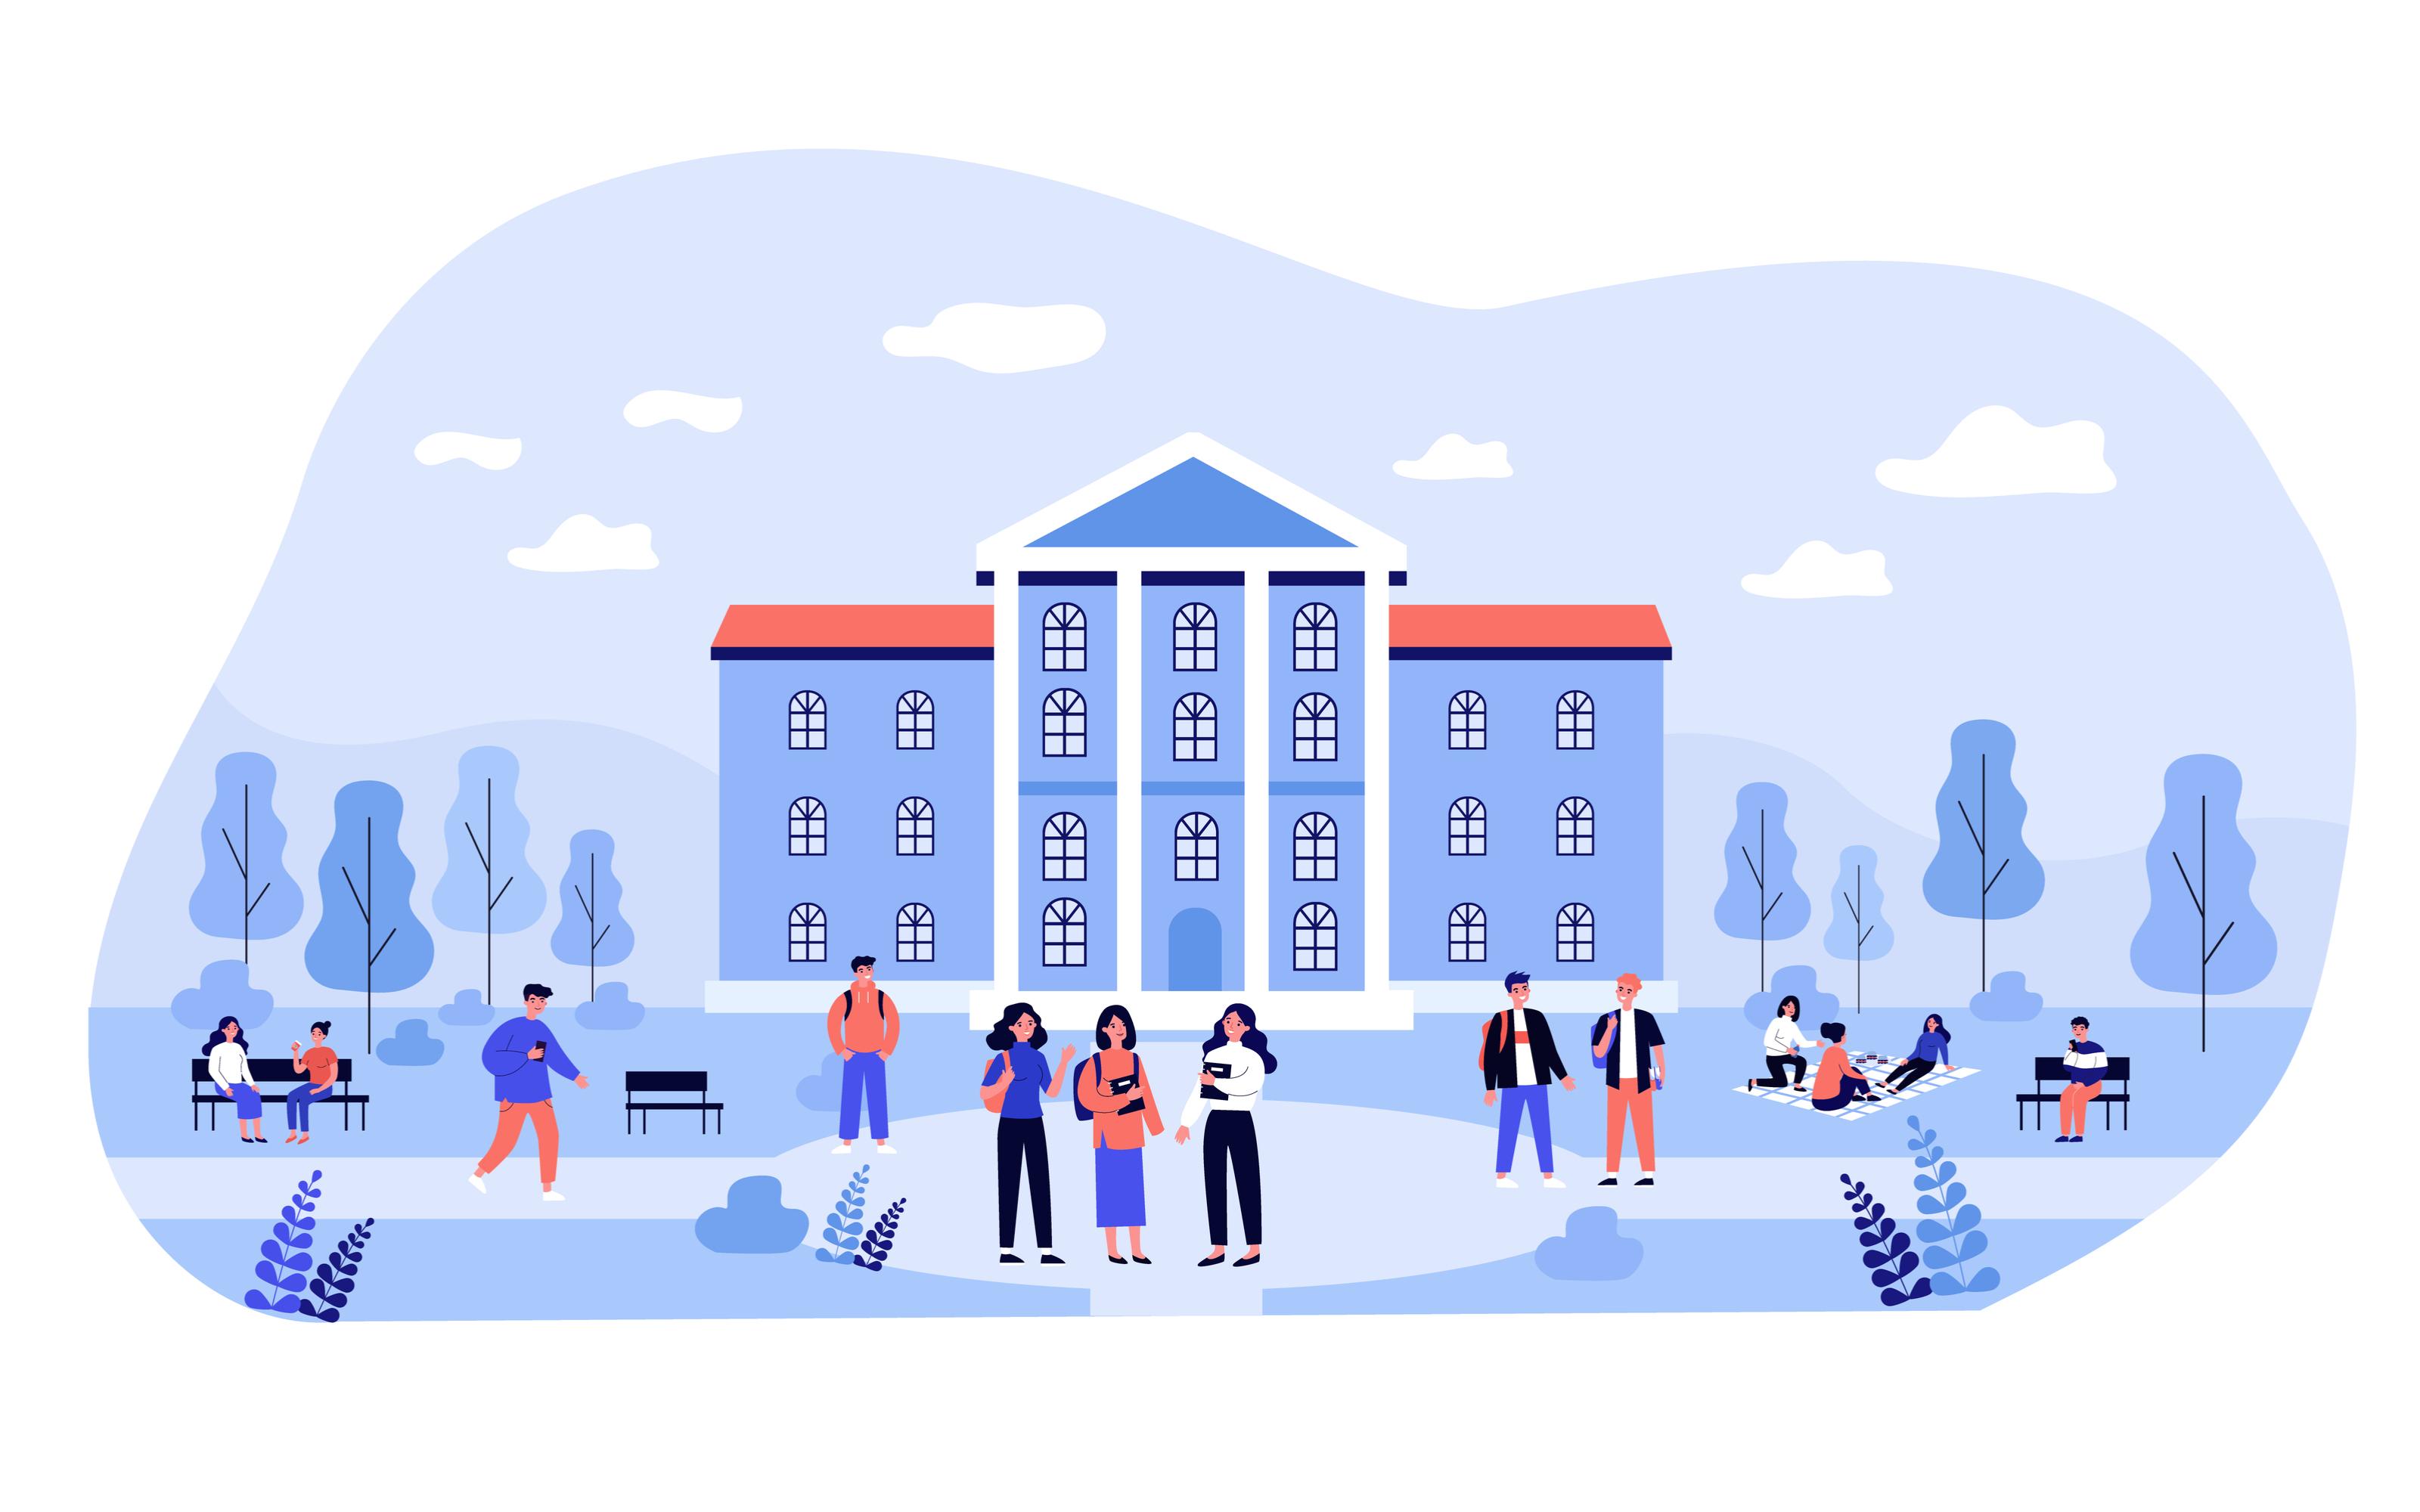 higher education university ranking 2021